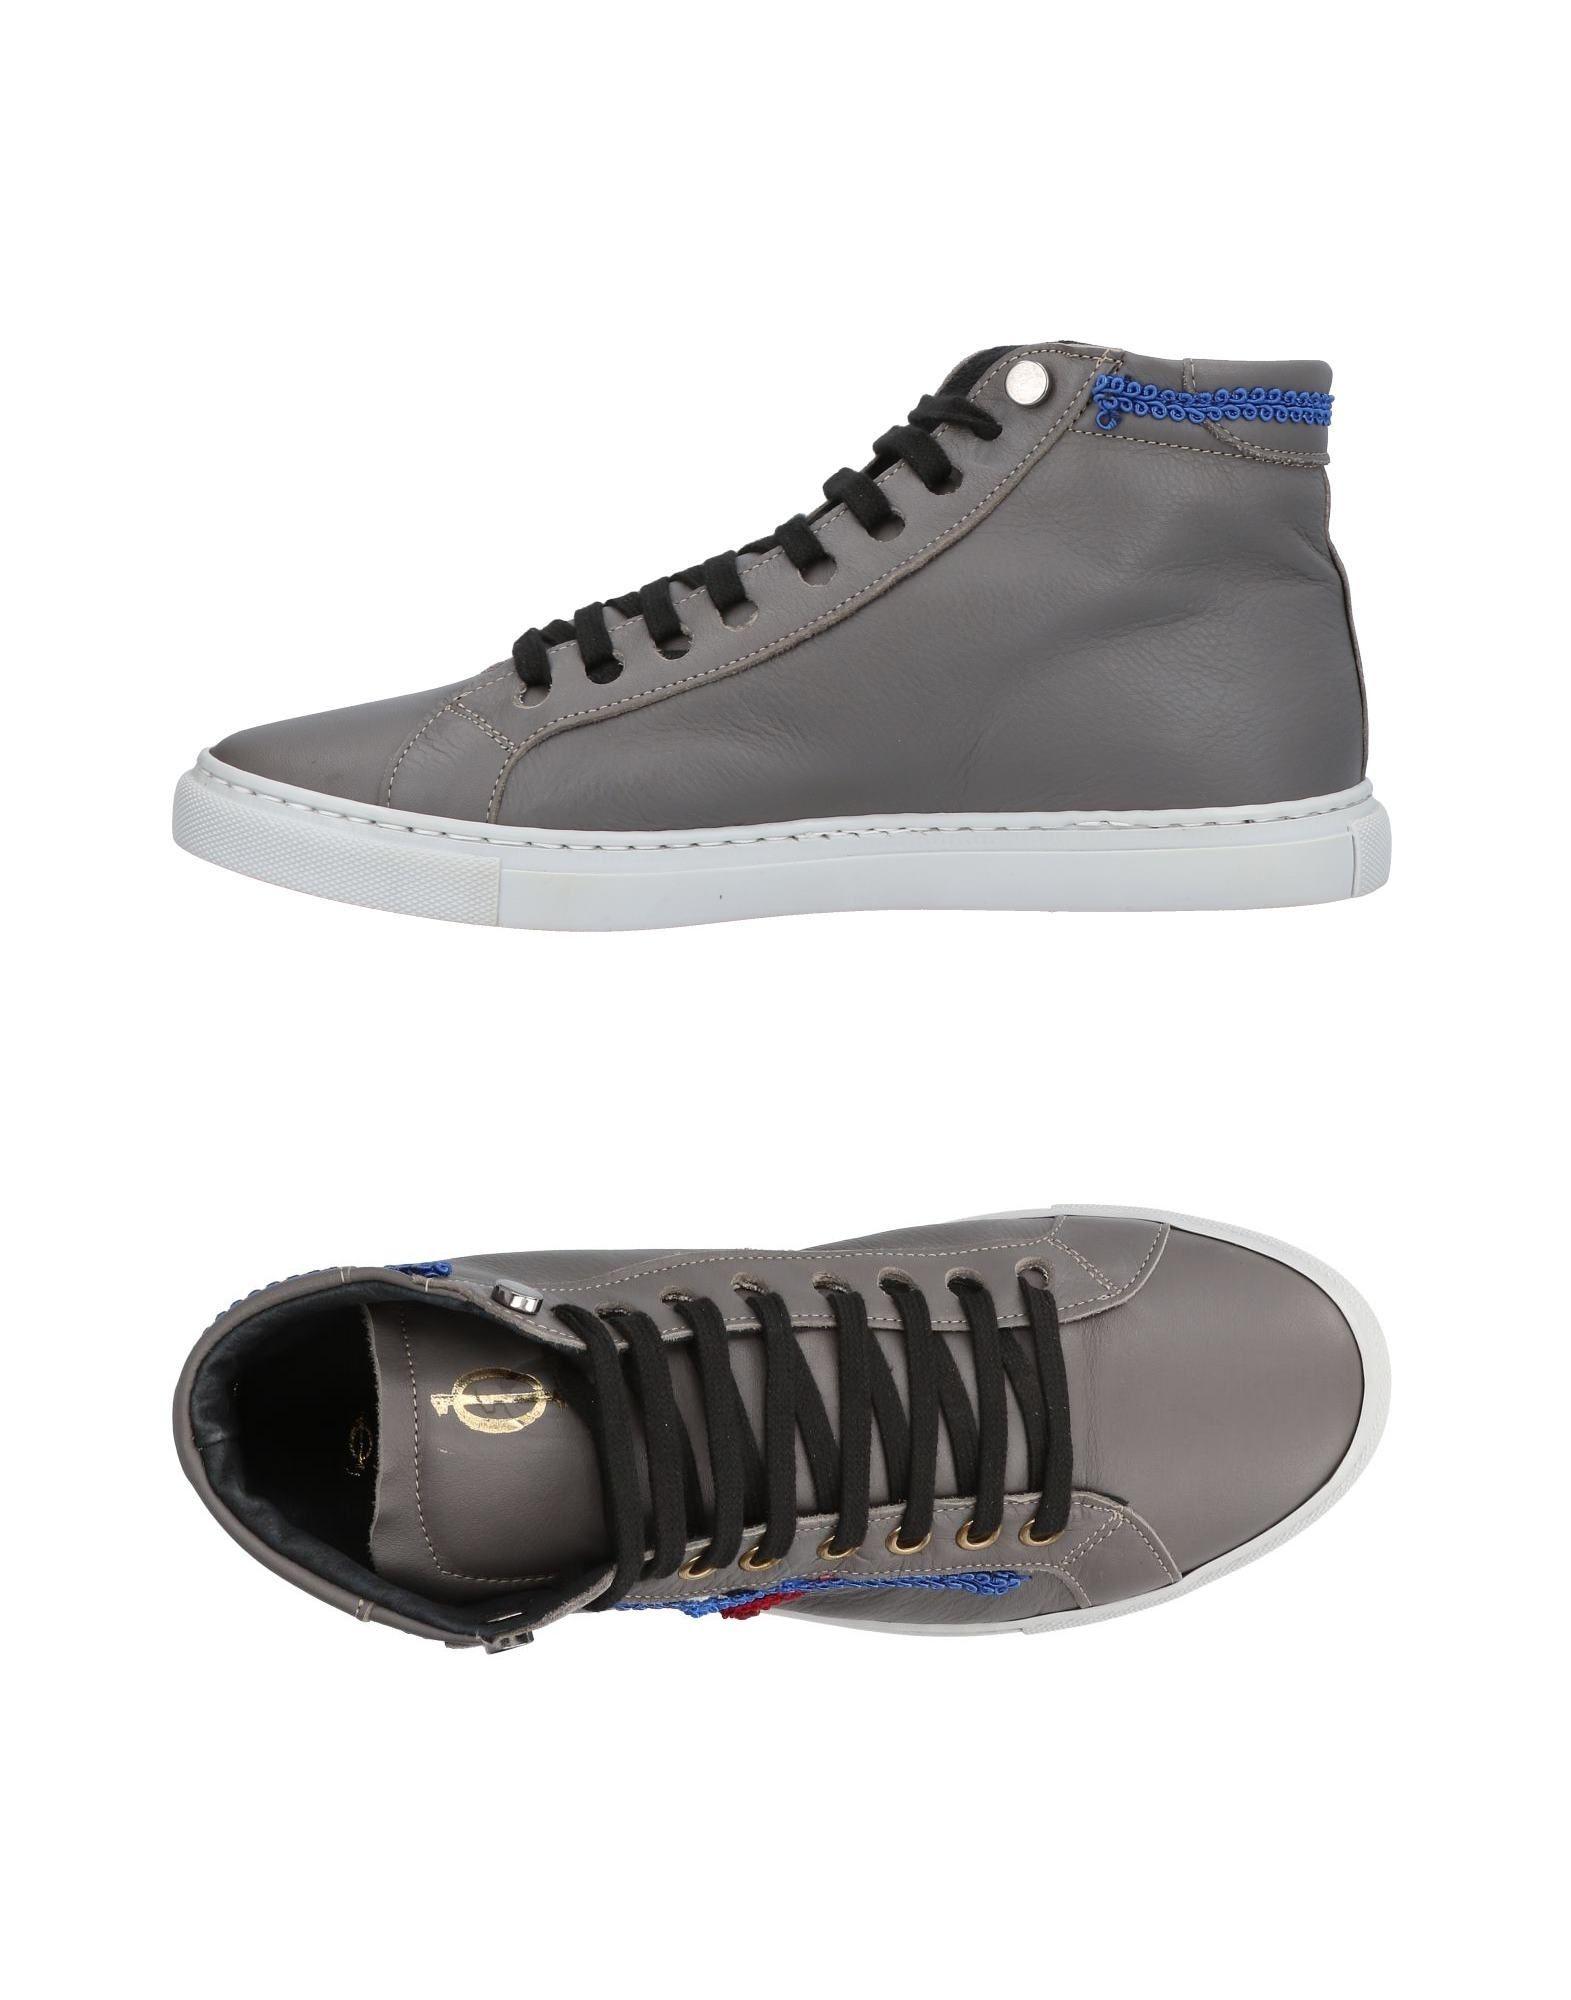 ONE WAY Высокие кеды и кроссовки кеды кроссовки высокие dc council mid tx stone camo